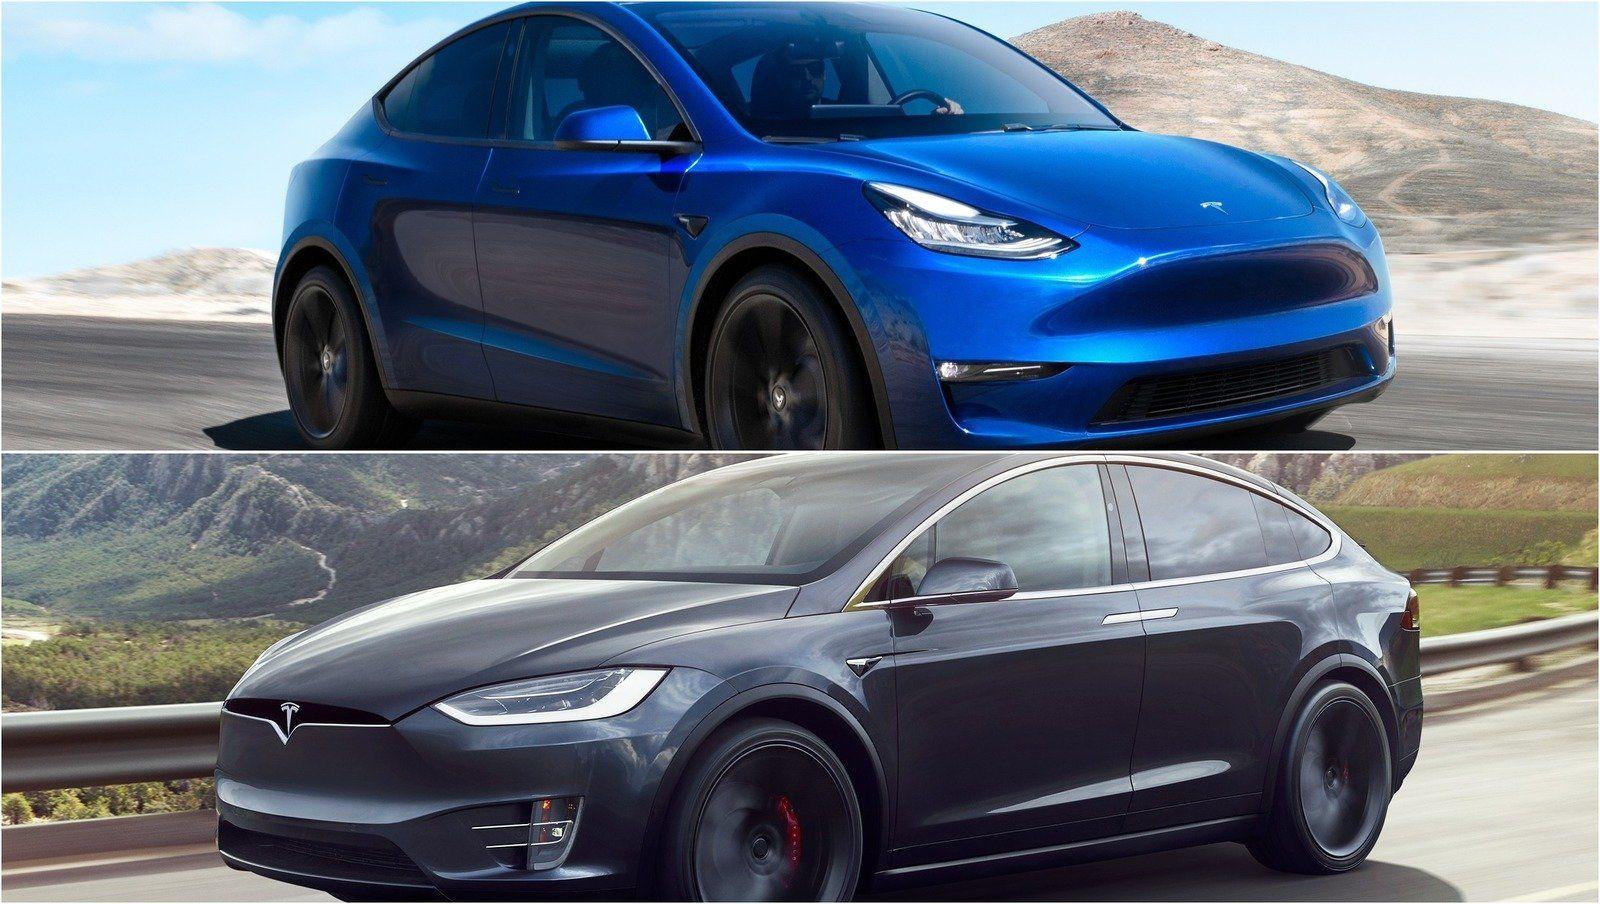 2020 Tesla Model Y Vs 2019 Tesla Model X In 2020 Tesla Model Tesla